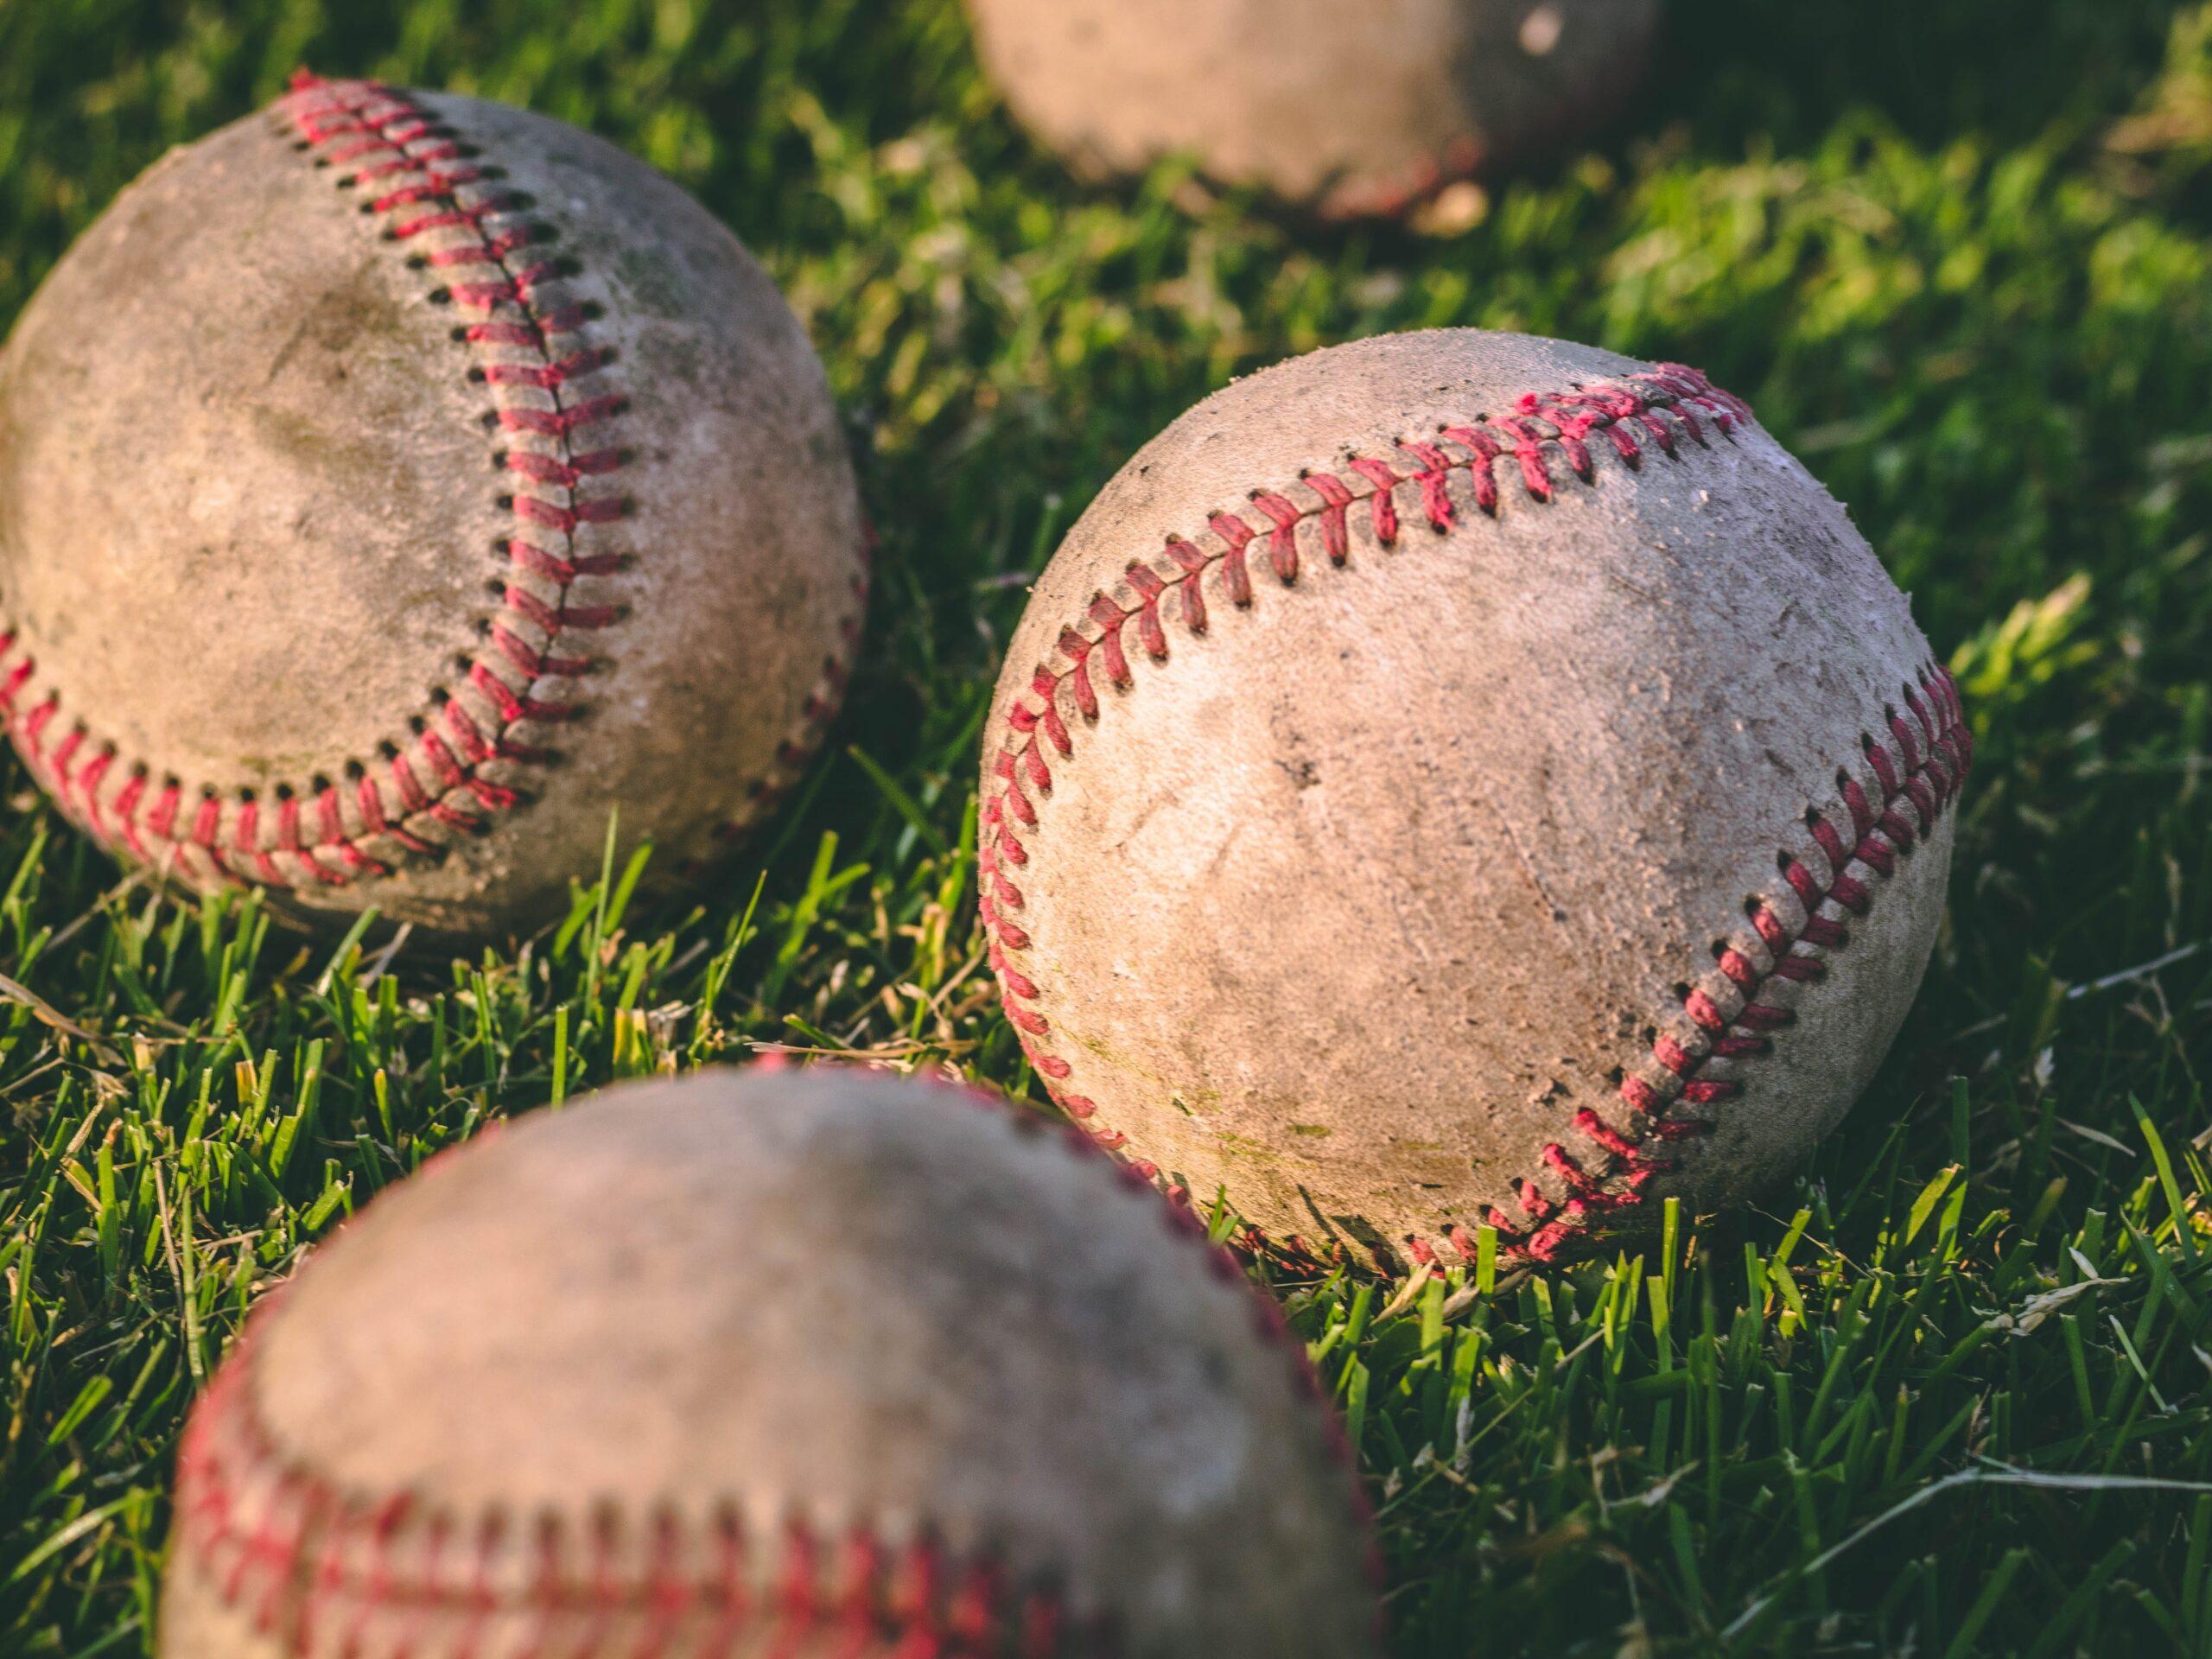 Baseballs sitting in a grassy field.